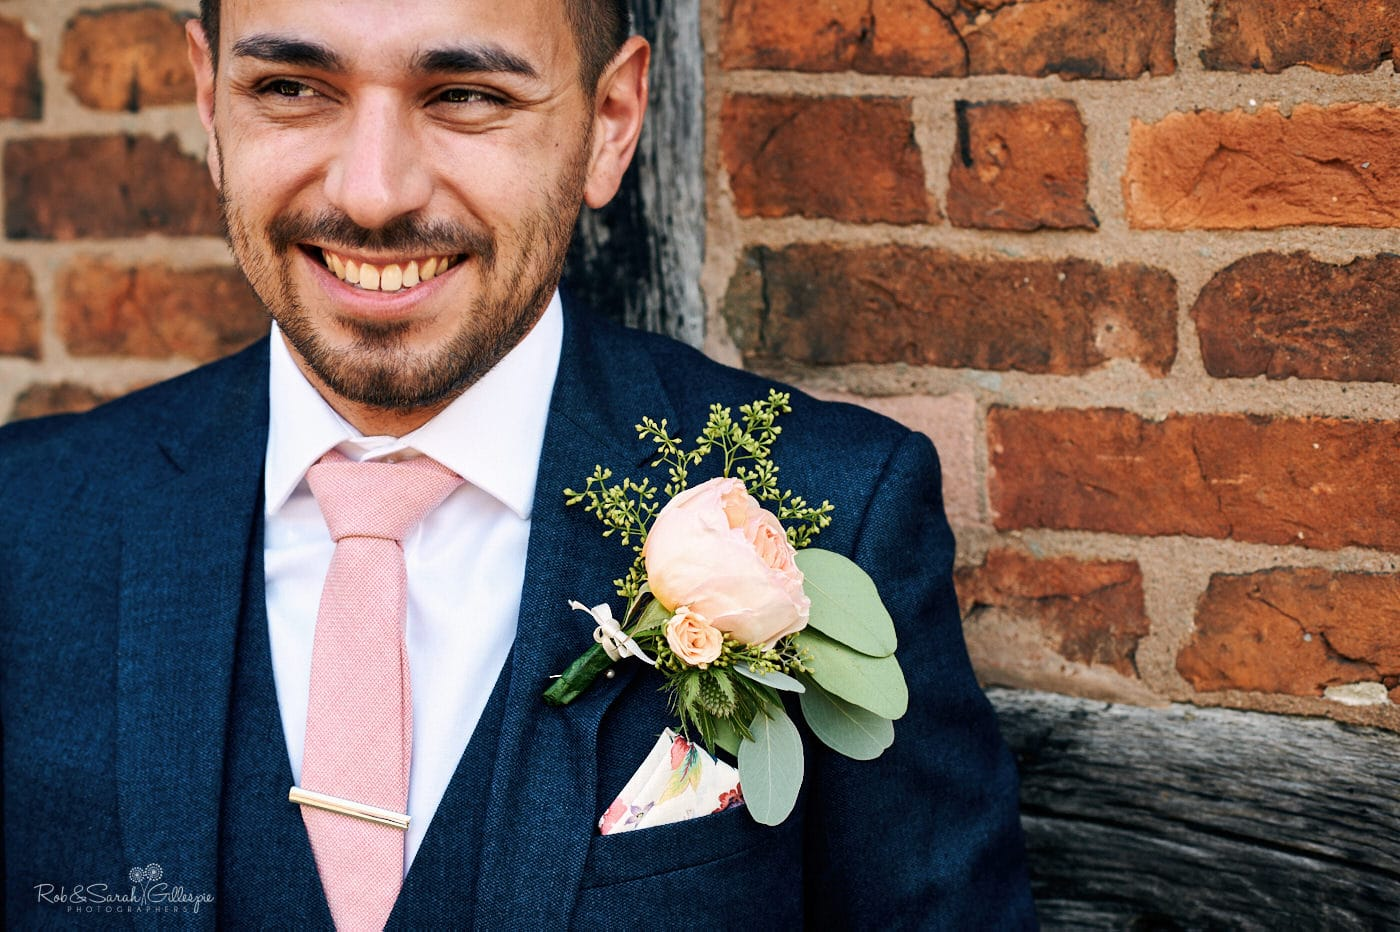 Portrait of groom at Gorcott Hall wedding